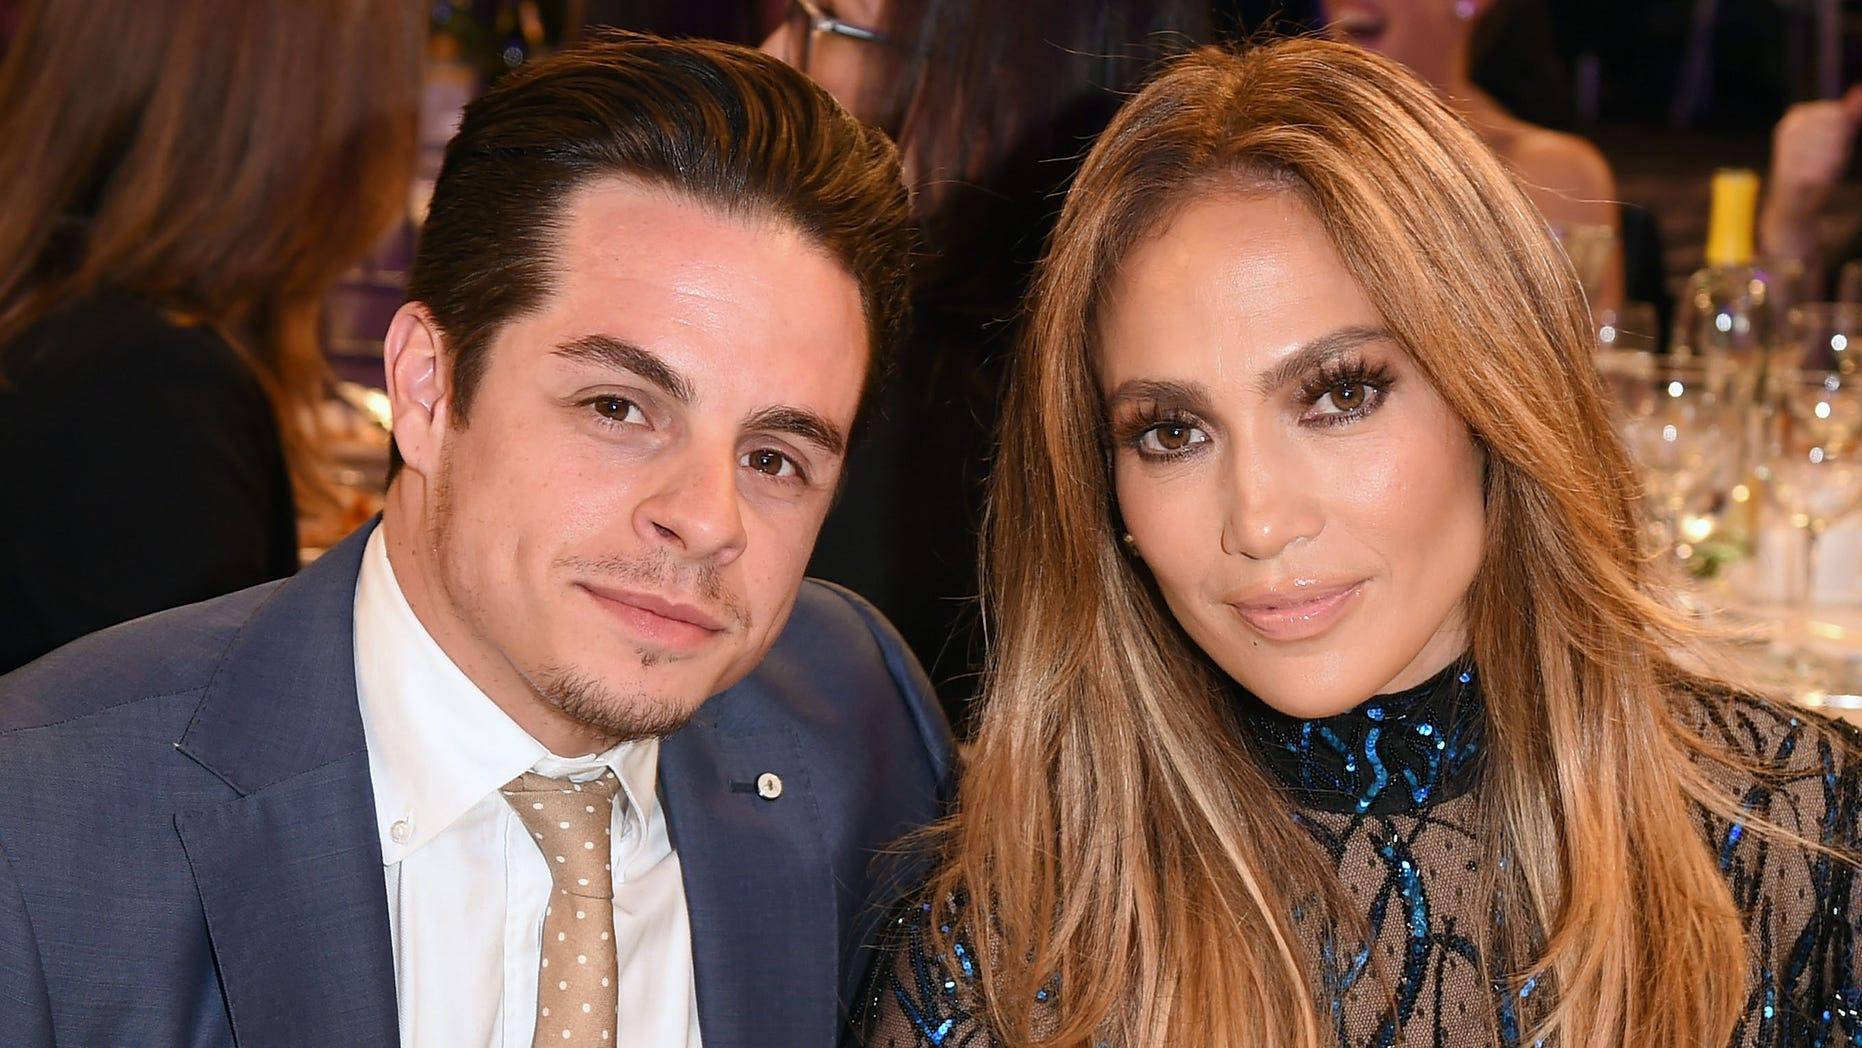 Jennifer Lopez and Casper Smart at GLAAD Media Awards on April 12, 2014 in L.A.